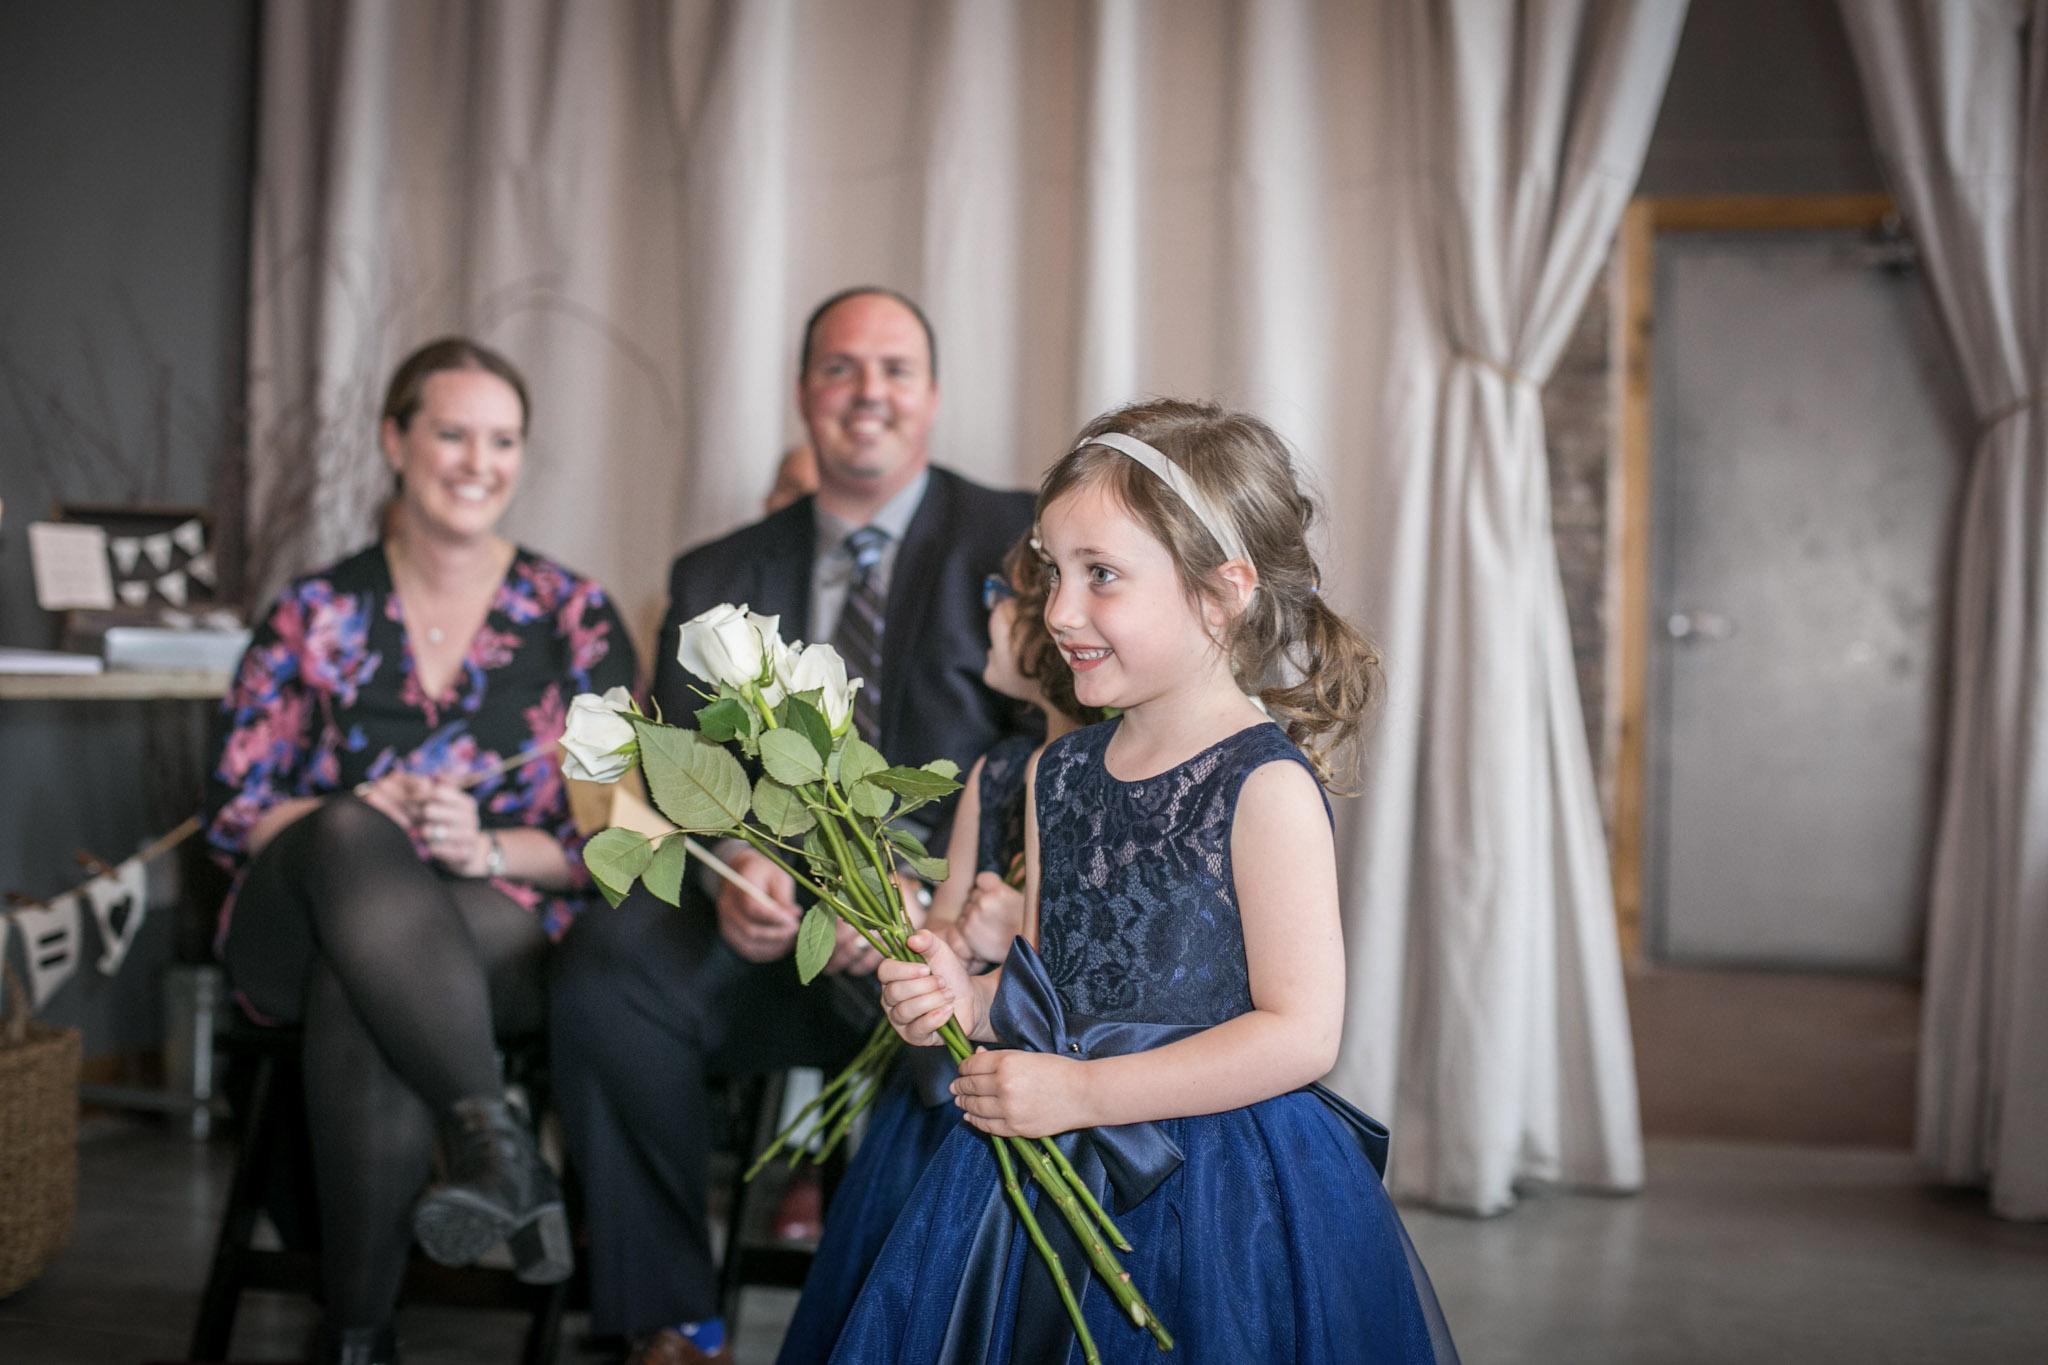 The_Vow_Exchange_Kansas_City_Small_Budget_Wedding_Venue_Andrea&Jon-061.jpg